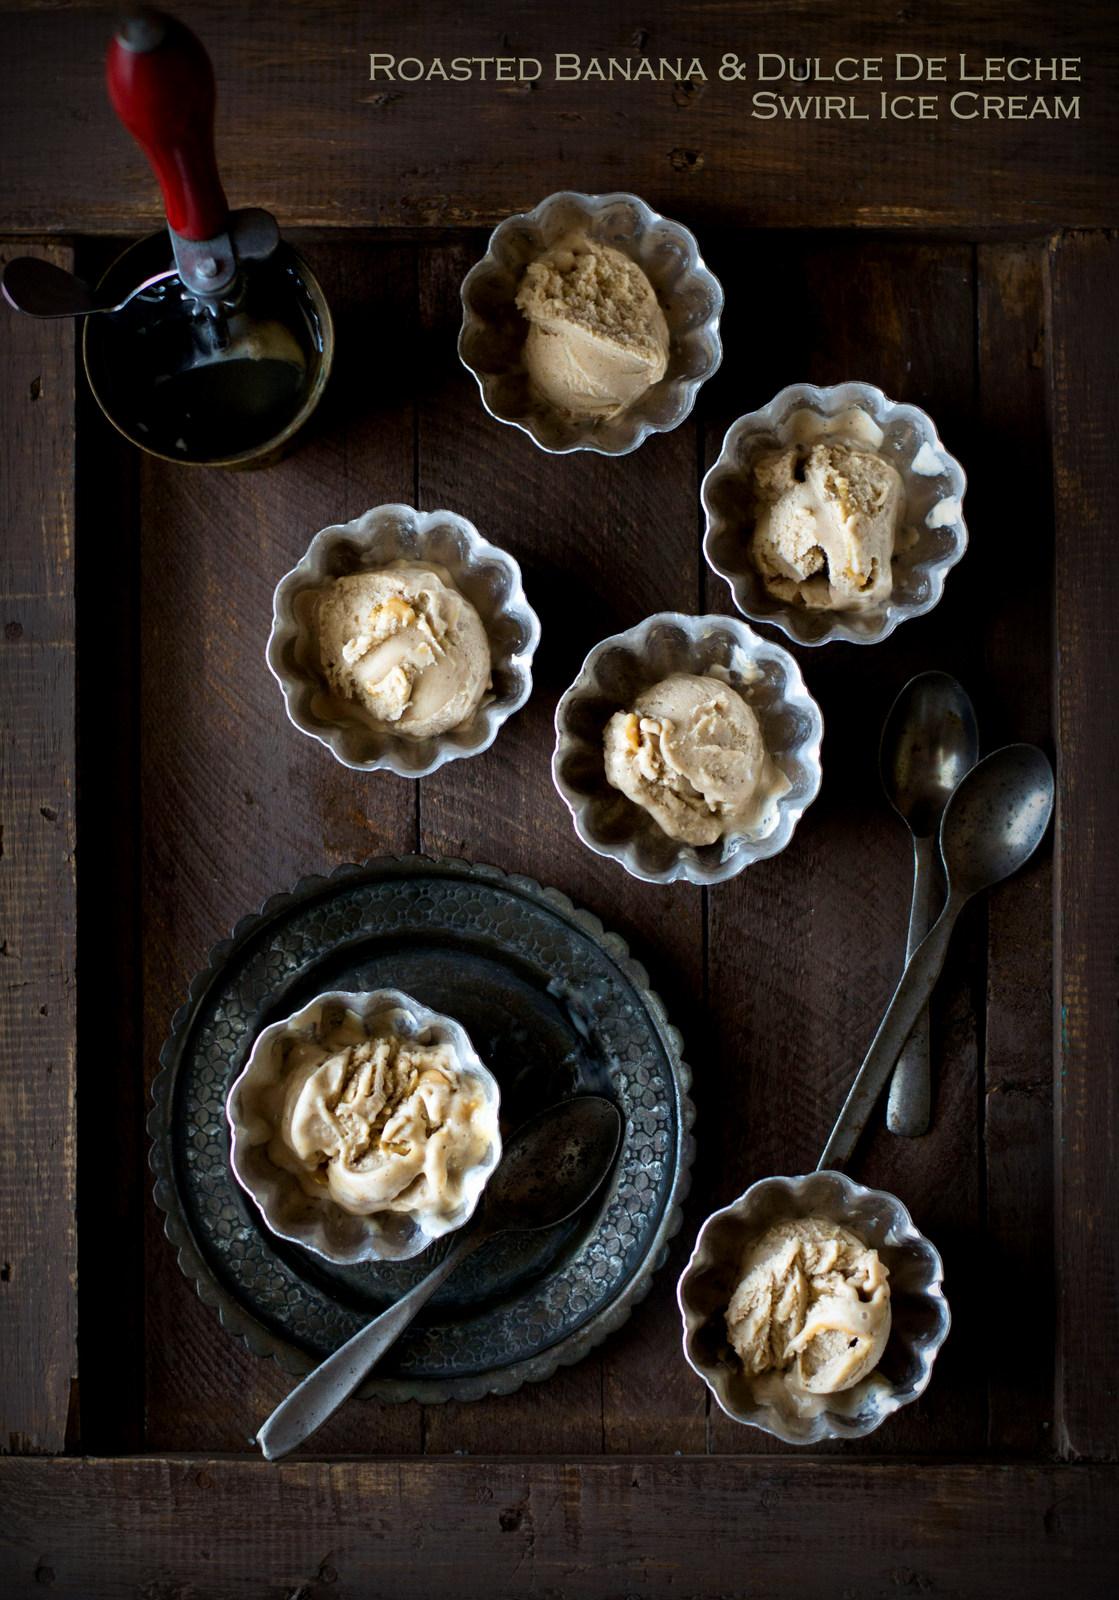 Chocolate Banana Swirl Cake Recipe With Plain Flour